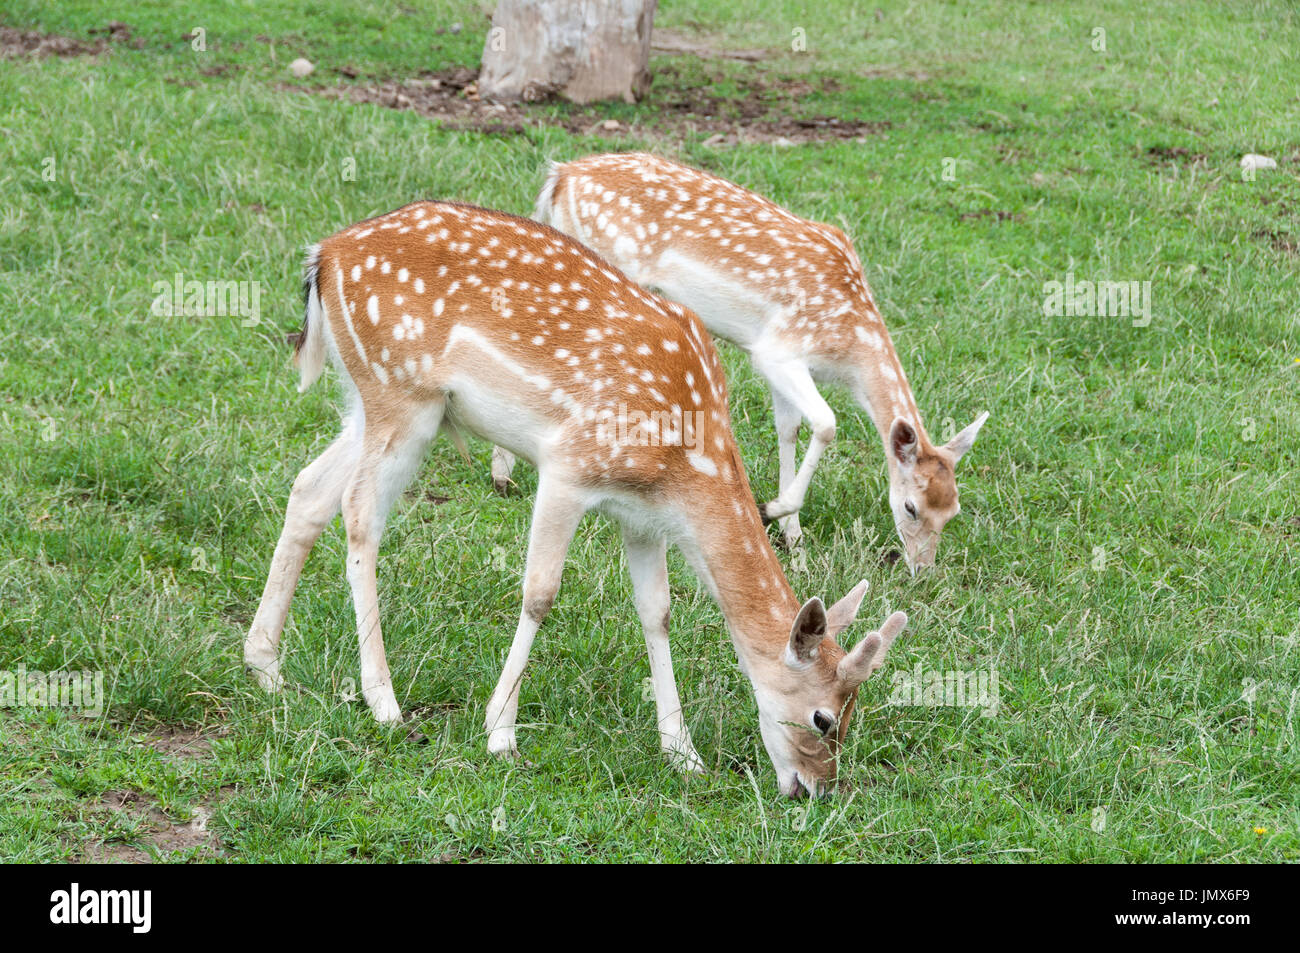 The fallow deer (Dama dama) - Stock Image